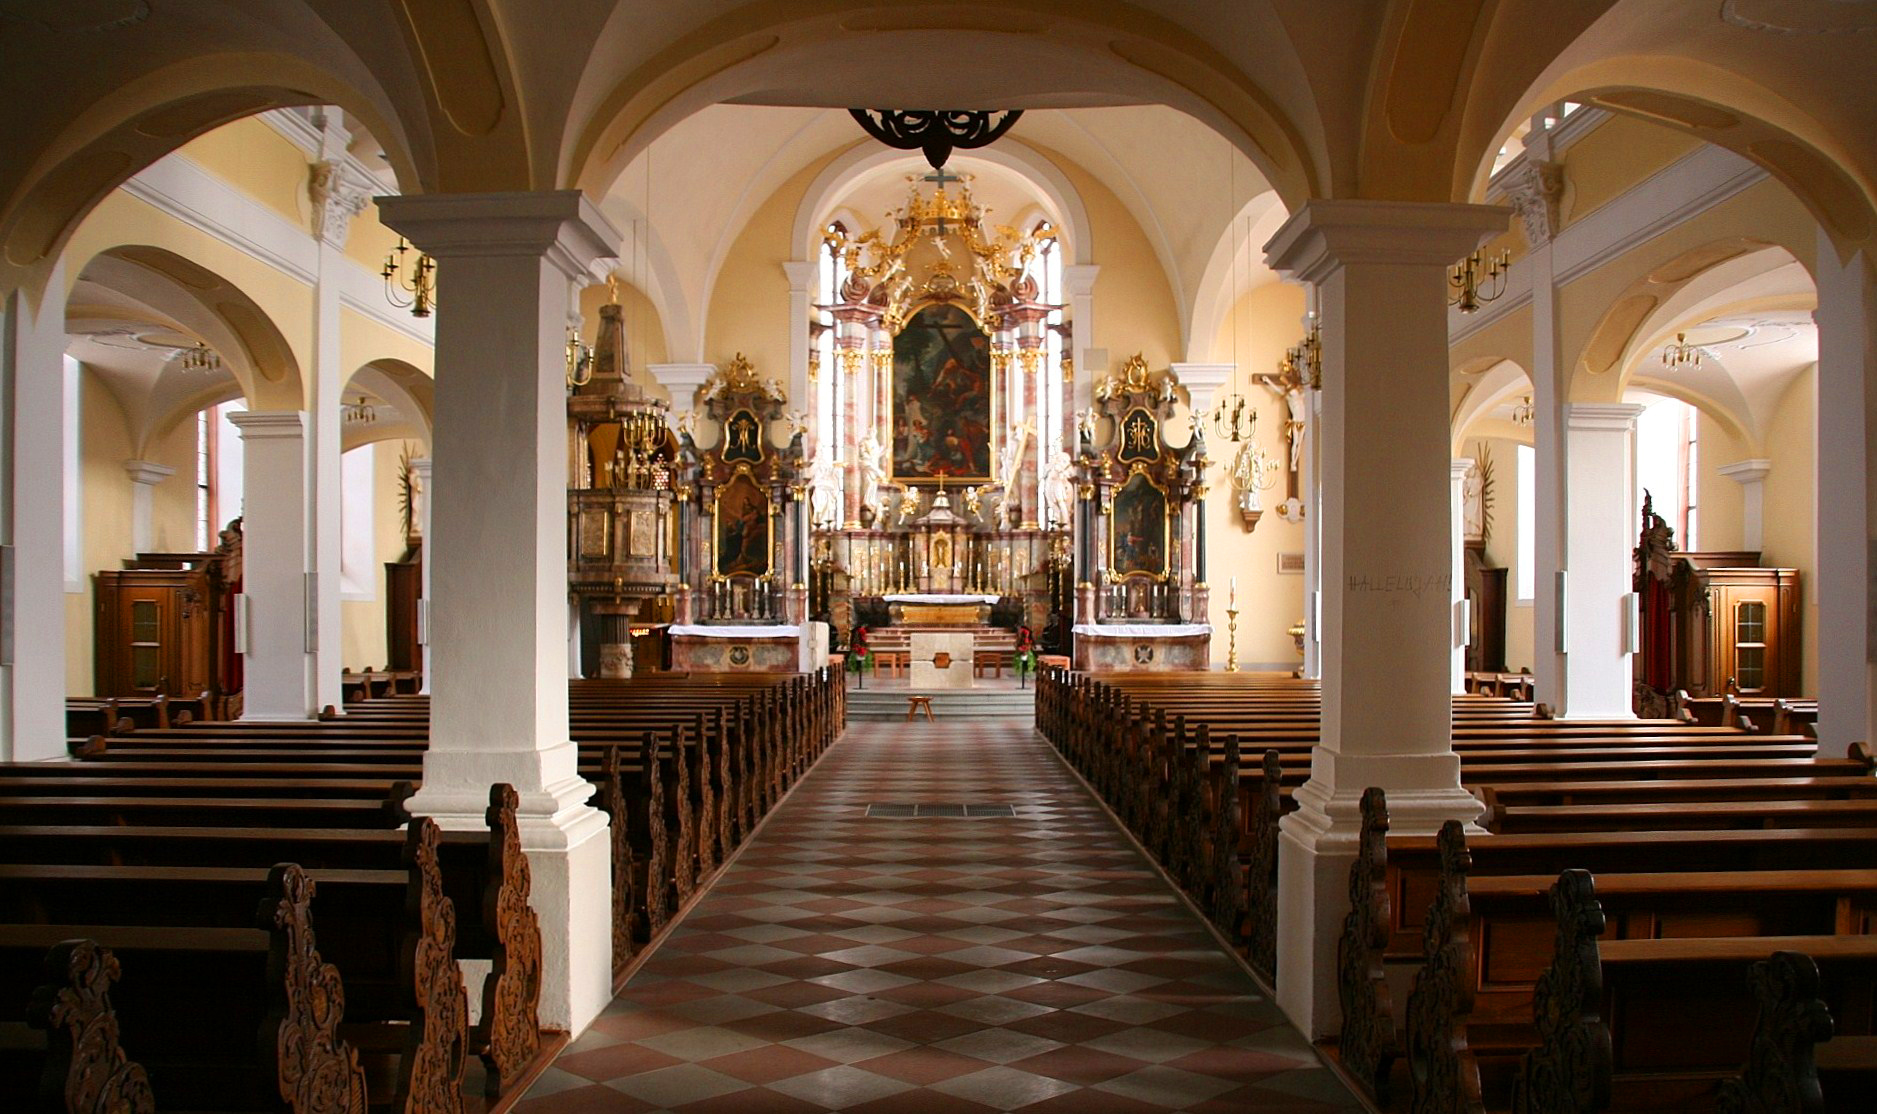 File:Heilig-Kreuz-Kirche, Offenburg - Innenraum.jpeg